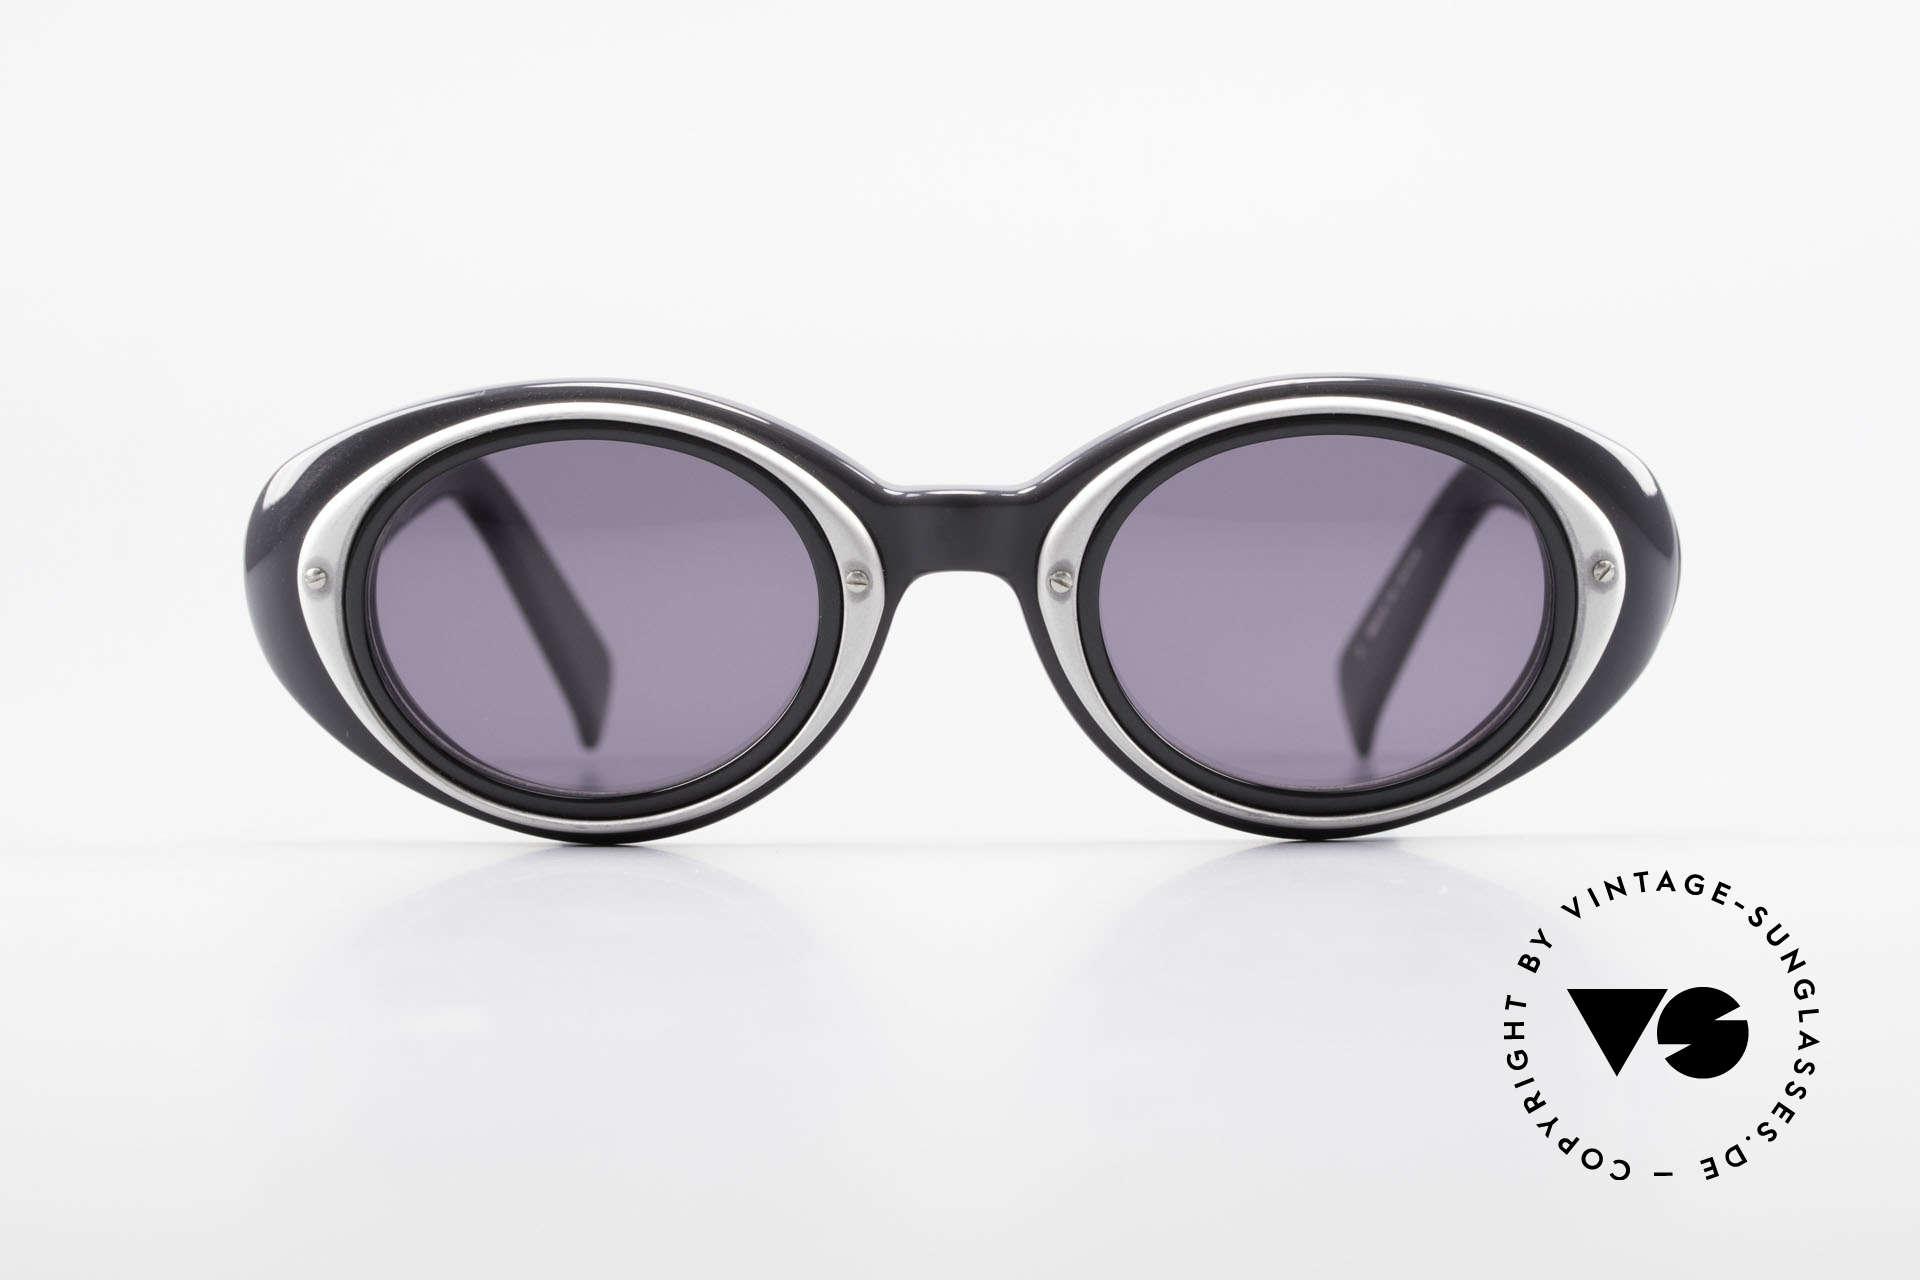 Yohji Yamamoto 52-7001 Sunglasses Kurt Cobrain Style, 1st class craftsmanship and materials (made in Japan), Made for Men and Women